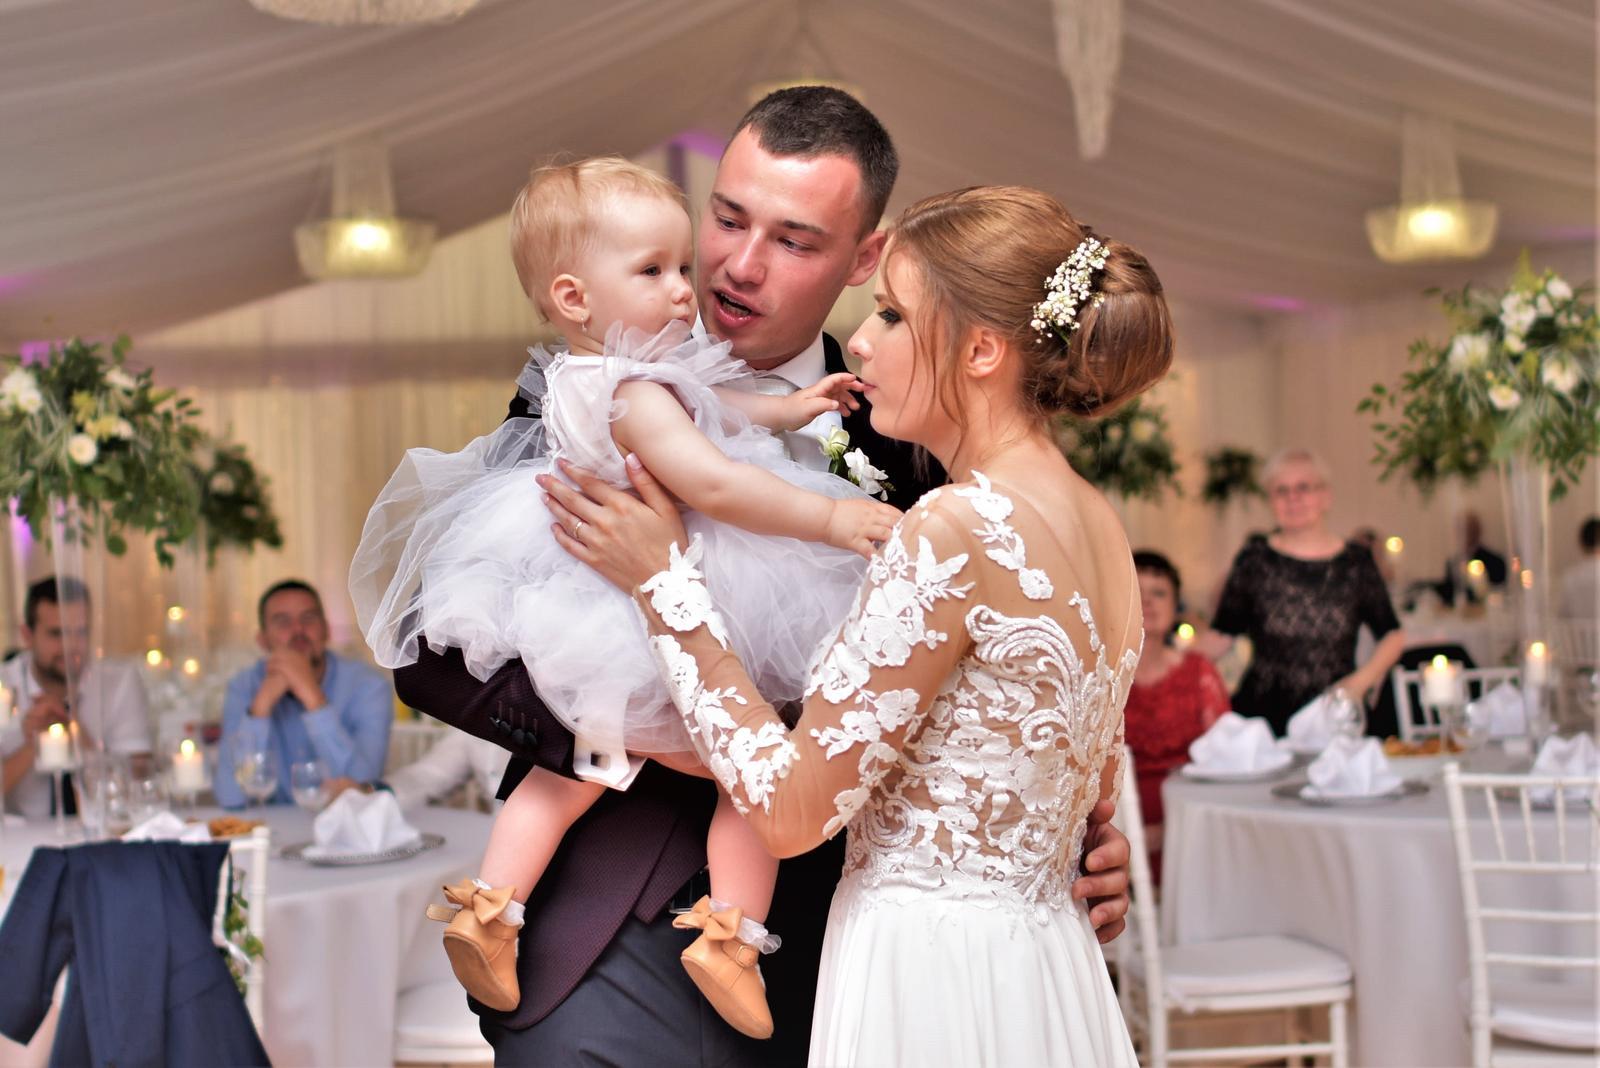 DJ + Fotografka na Vašu svadbu, Penzion Rosenthal, Ružindol - Obrázok č. 1